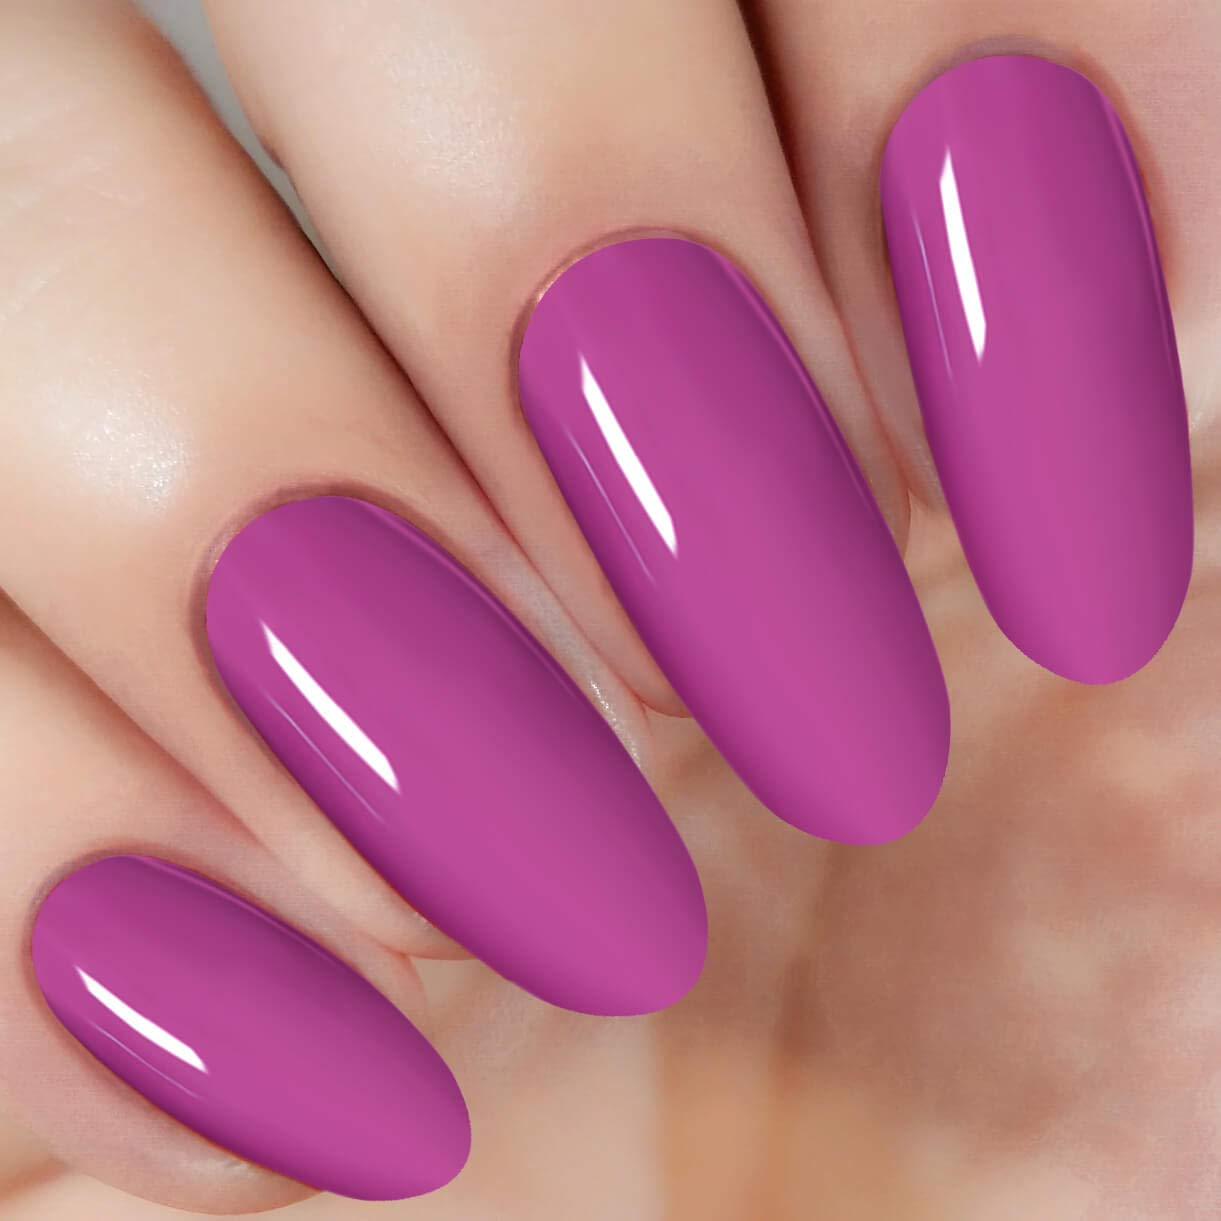 Purple Nail Dipping Powder (added vitamin) I.B.N Dipped Acrylic Dip Powder DIY Manicure Salon Home Use, 1 Ounce/28g (DIP 020)